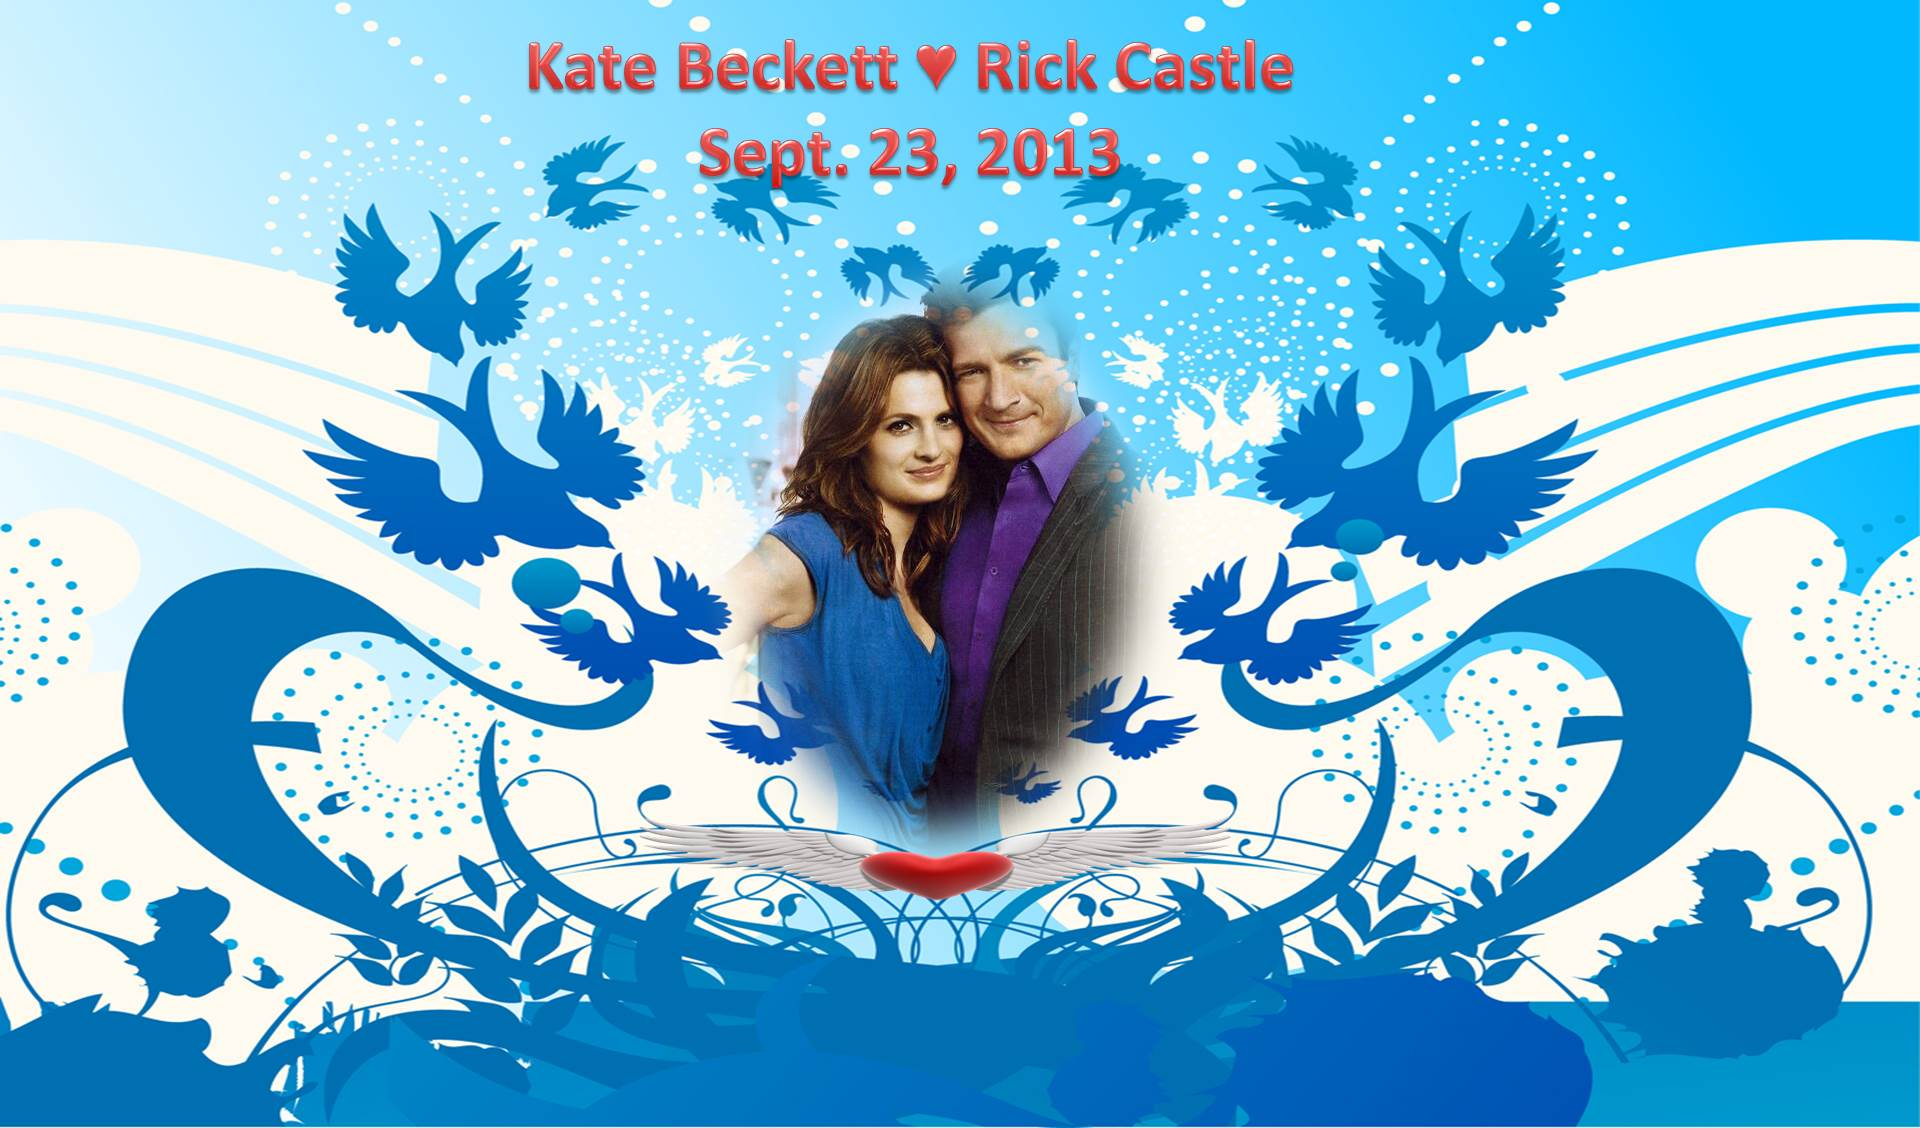 Kate ♥ Rick